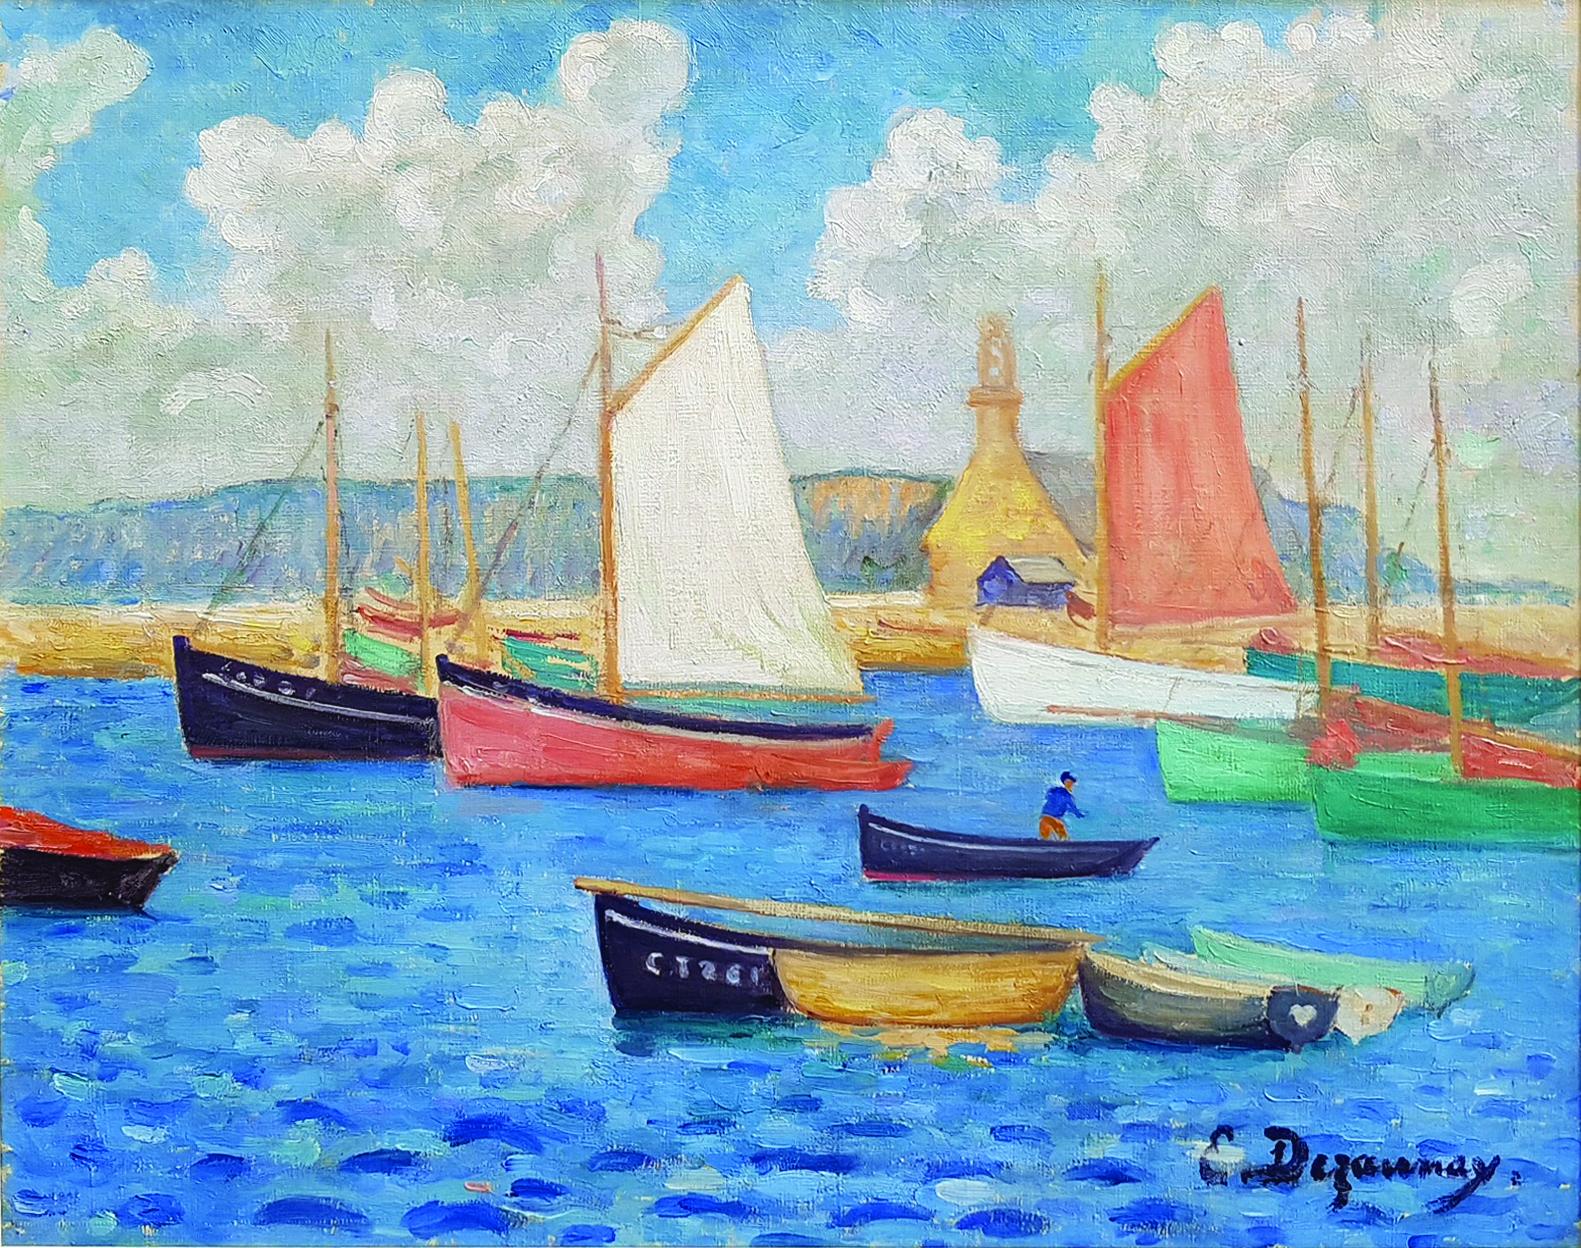 Marcel Jacquier (1877-1957)